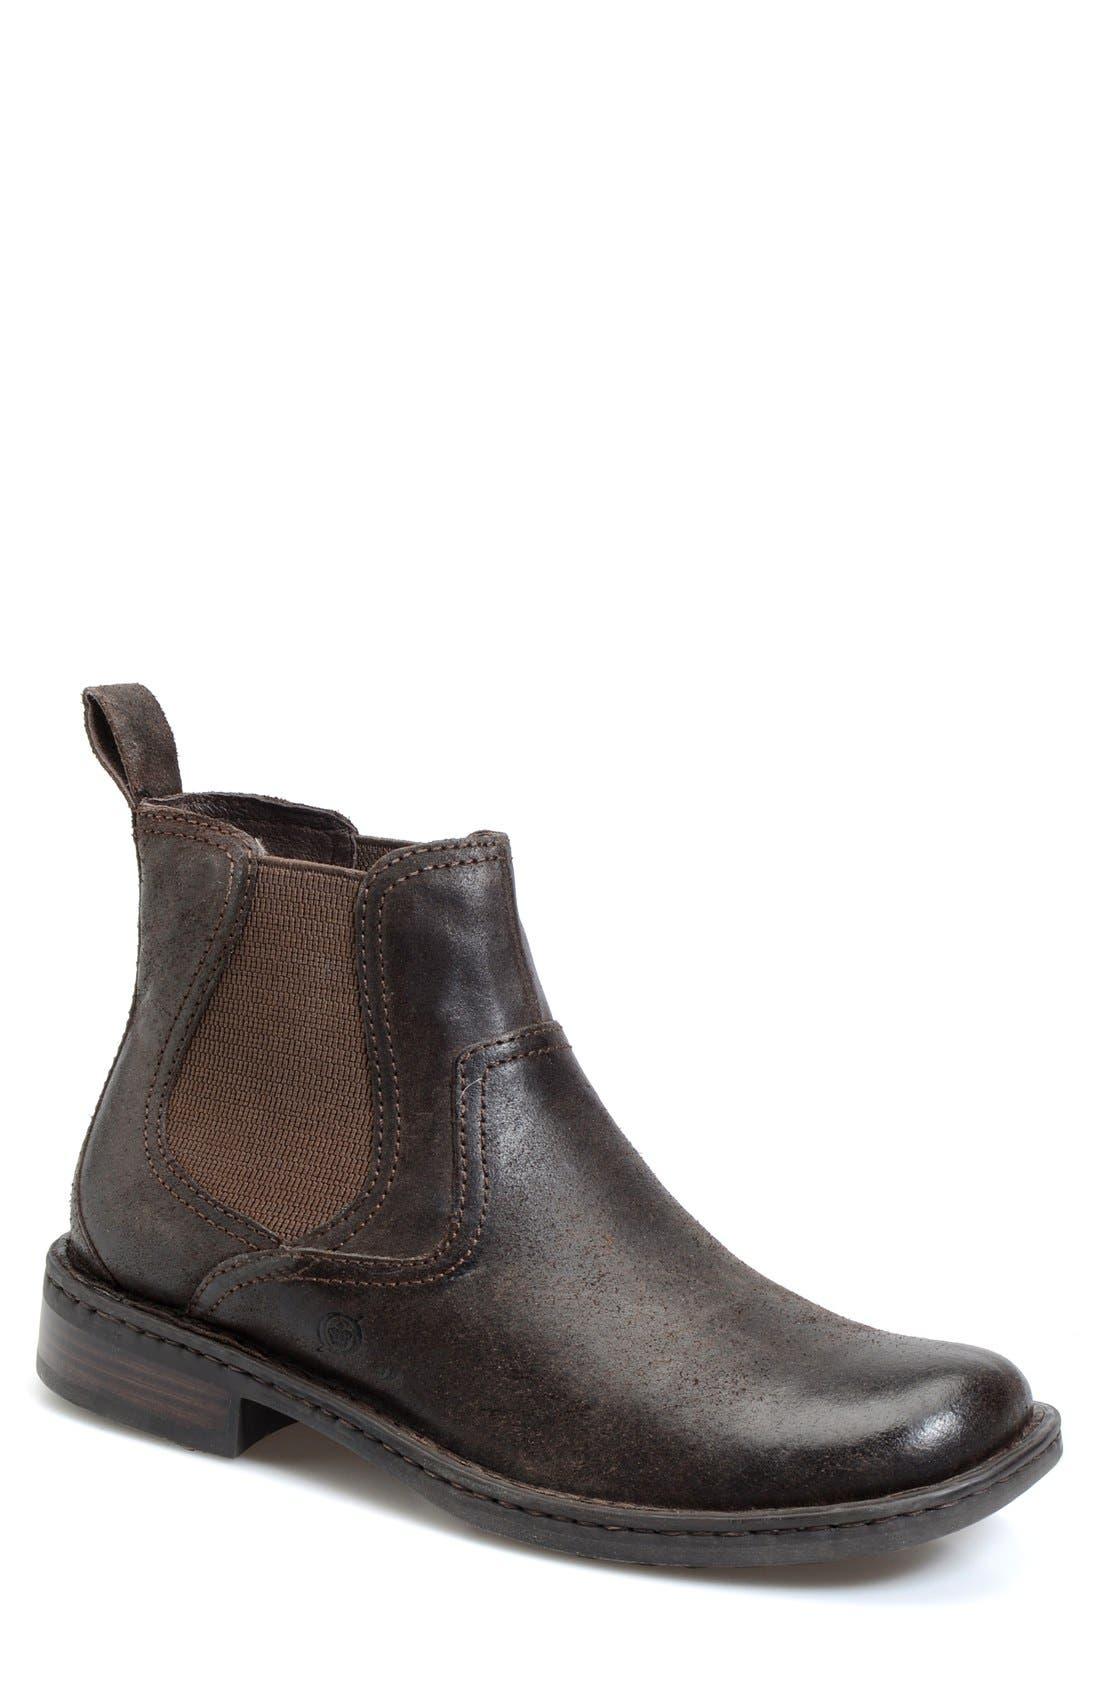 Main Image - Børn 'Hemlock' Boot (Online Only)